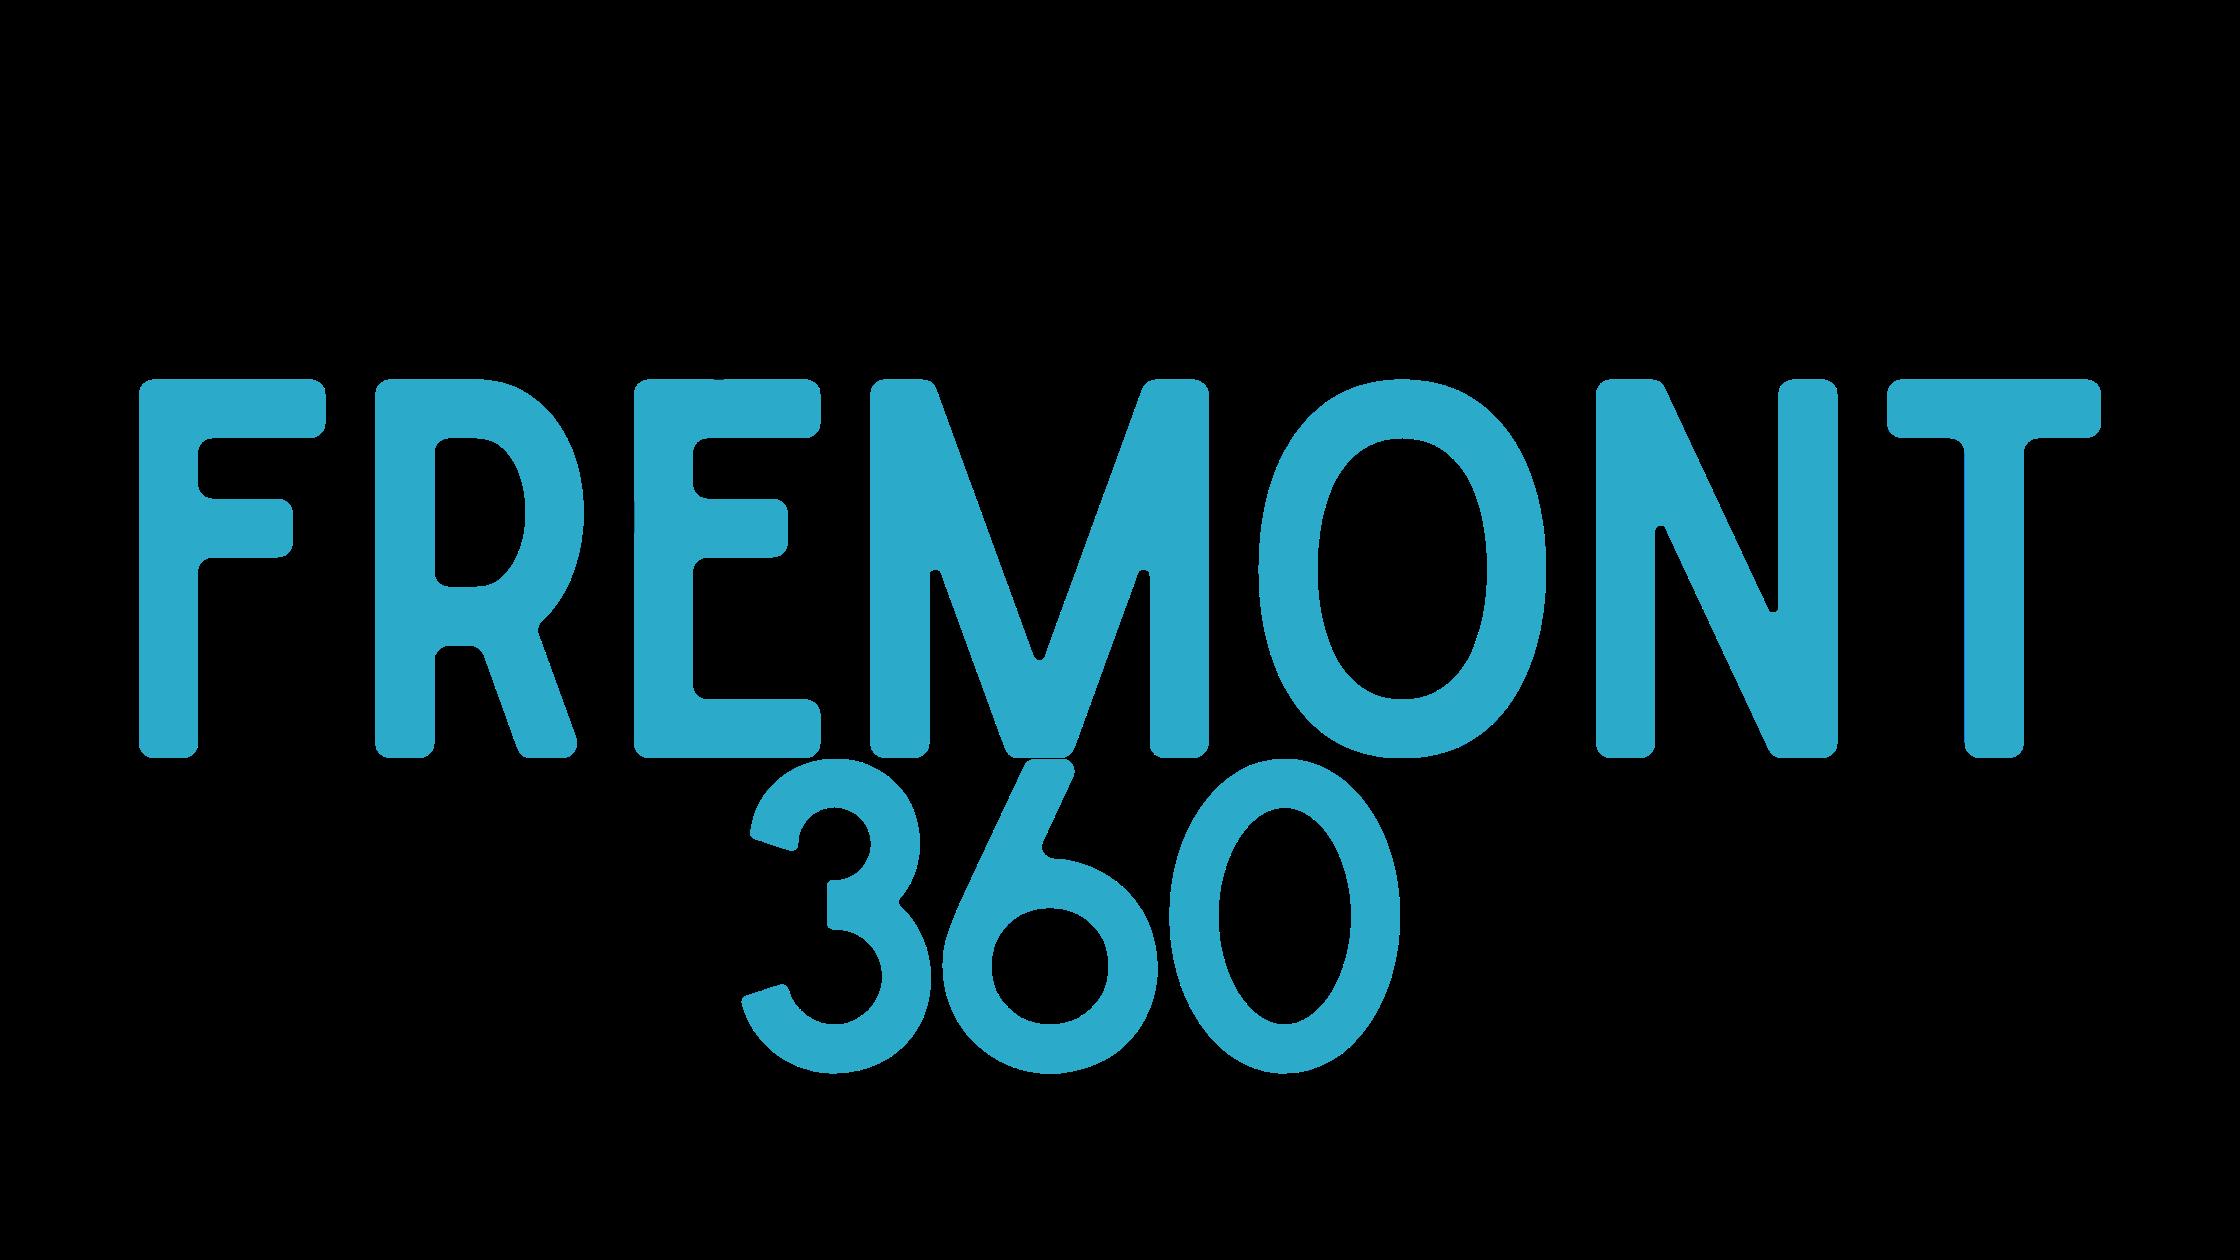 Fremont360